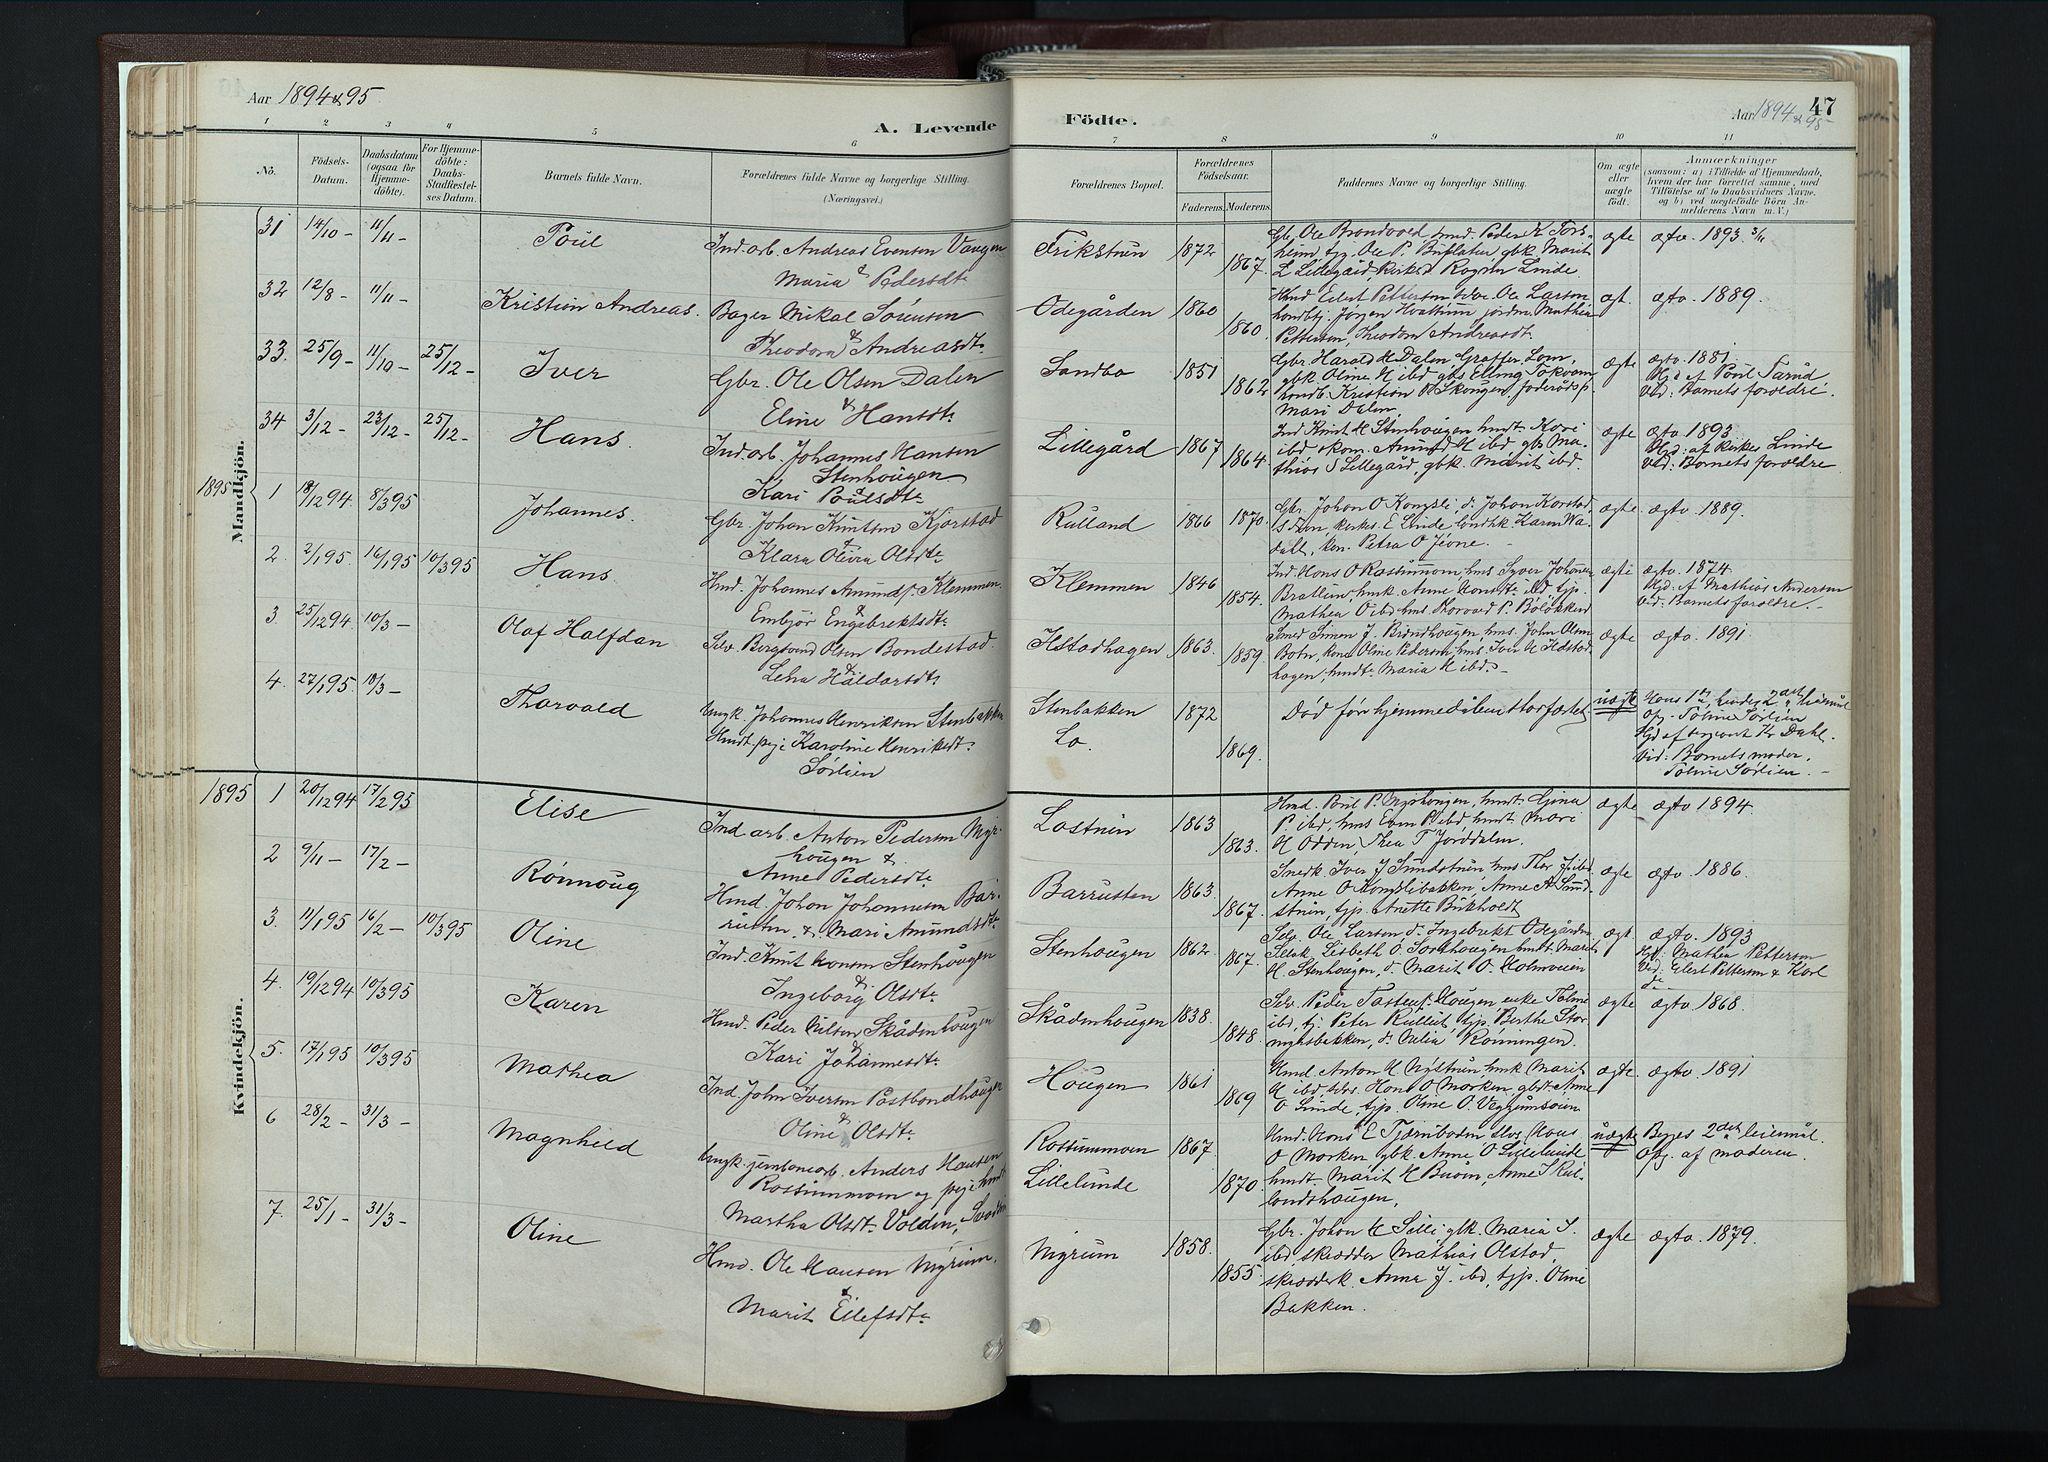 SAH, Nord-Fron prestekontor, Ministerialbok nr. 4, 1884-1914, s. 47